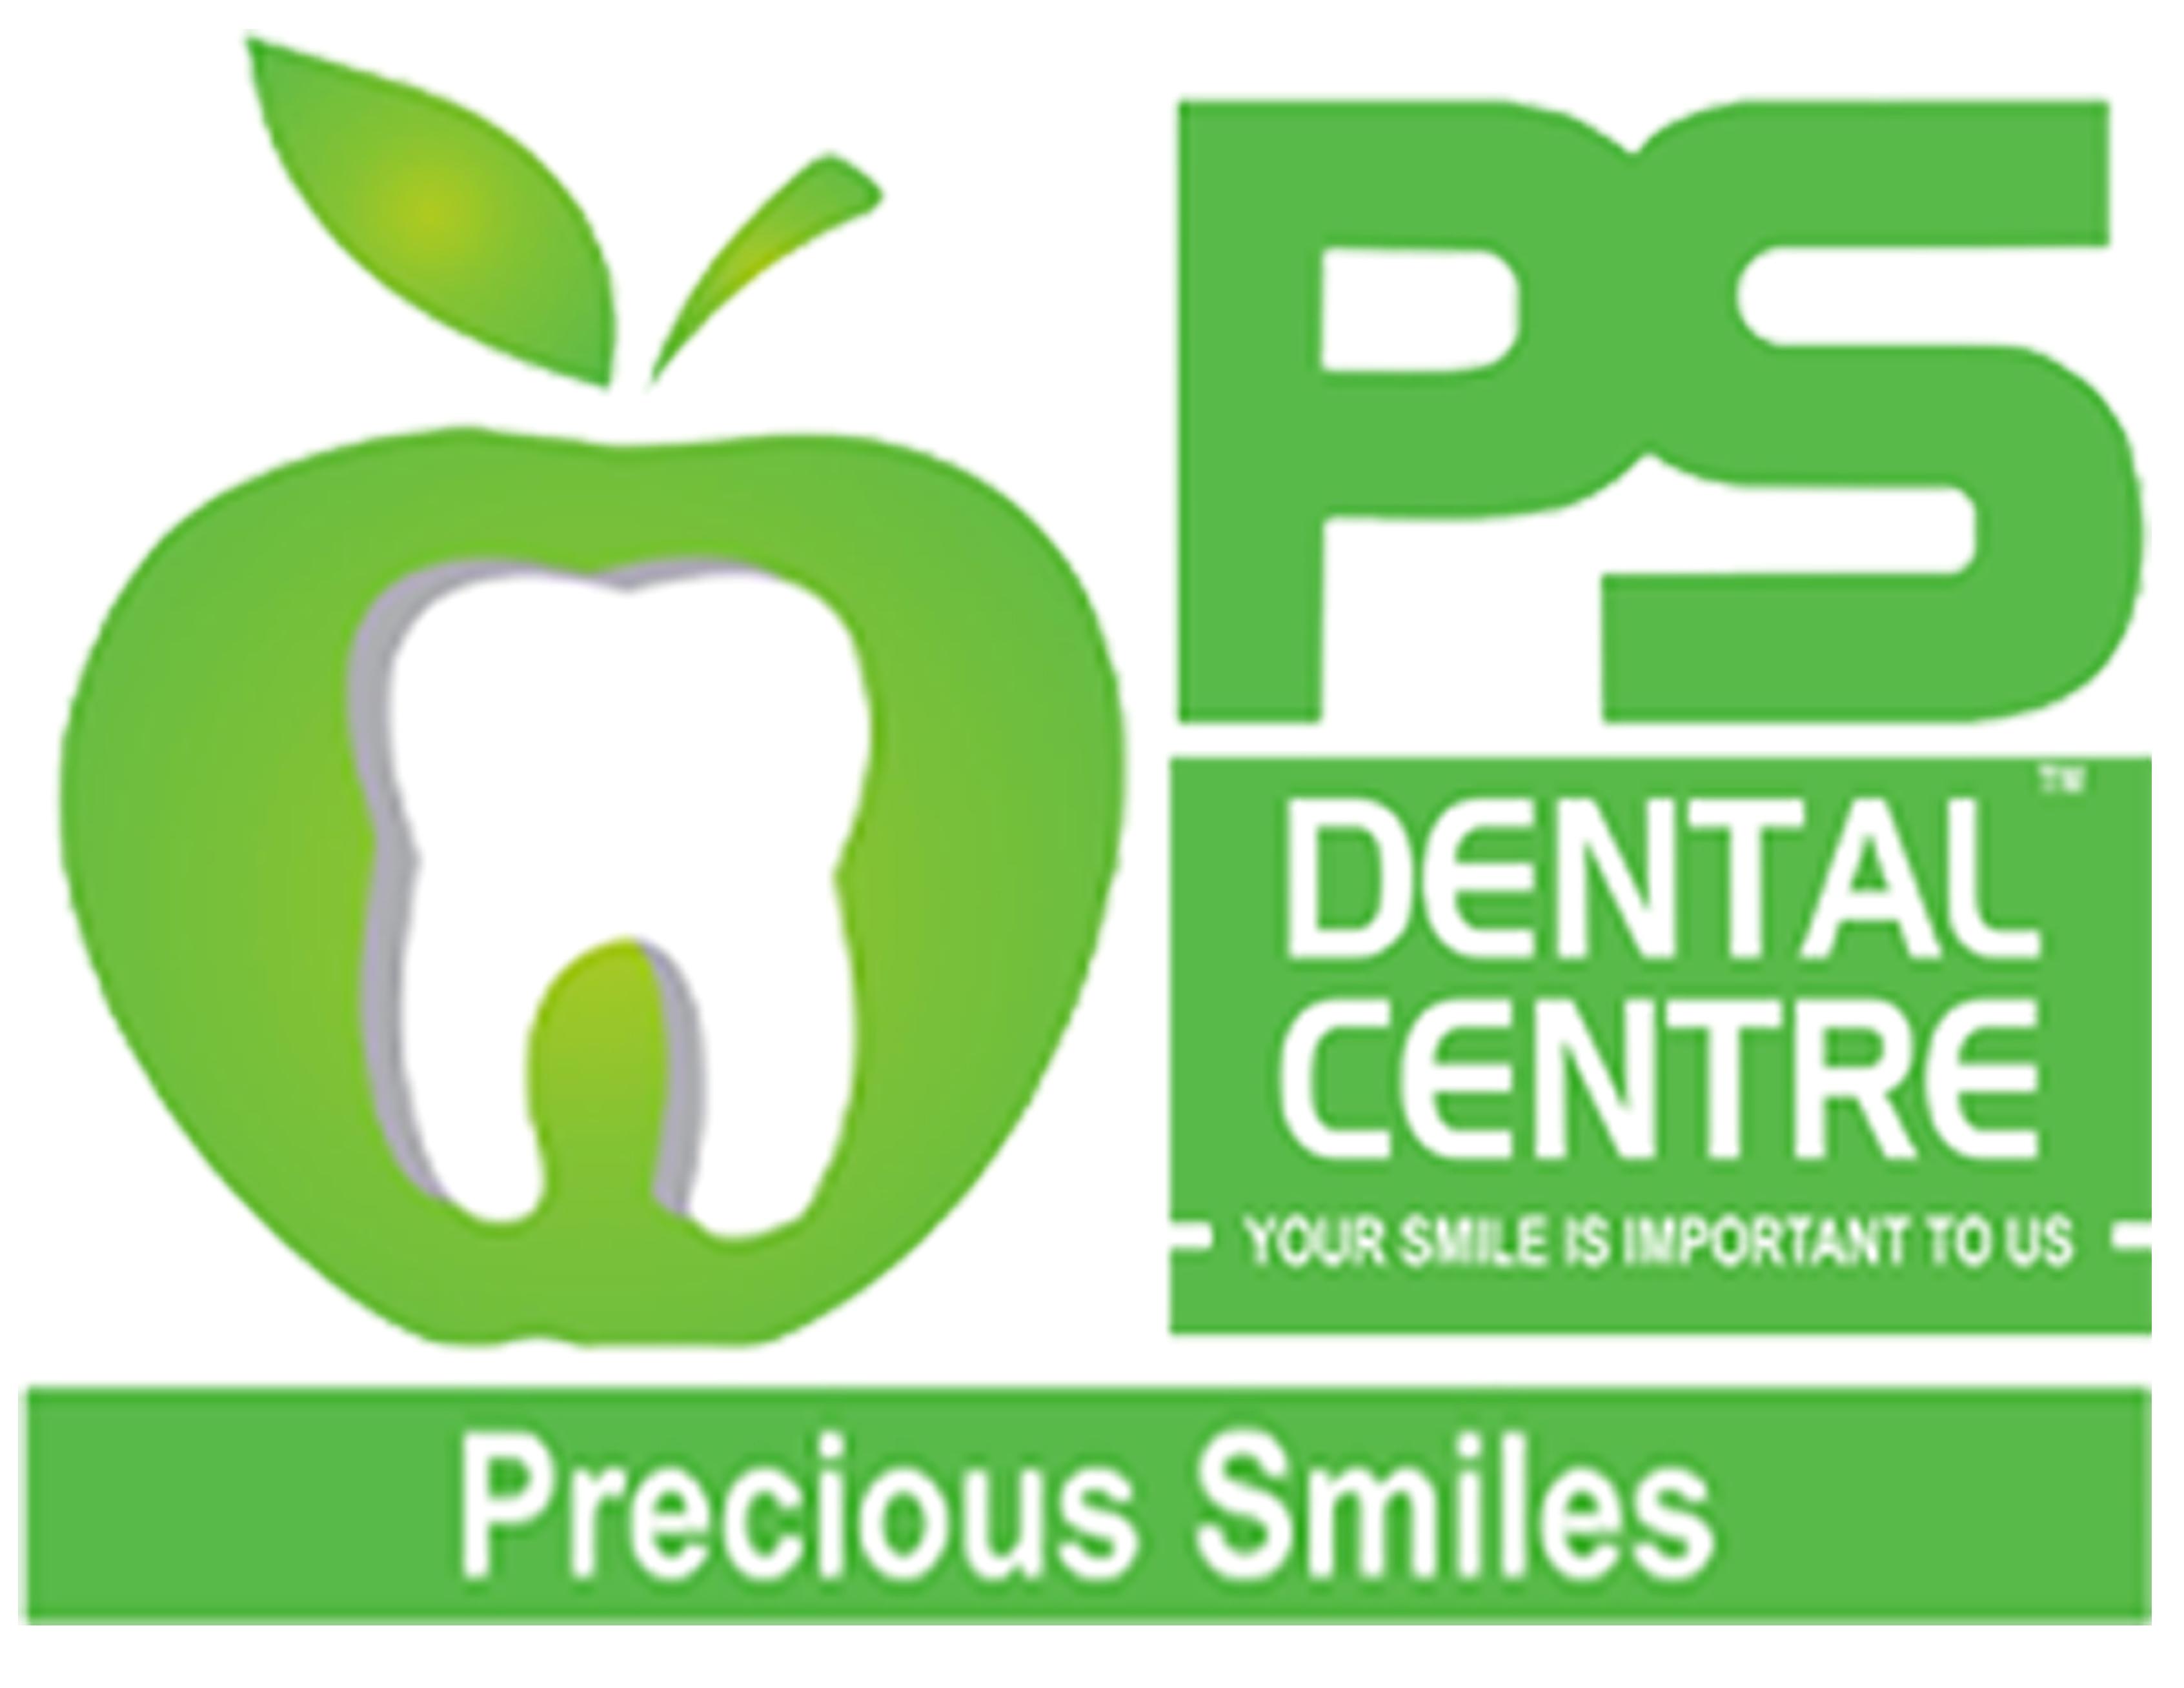 PS Dental Centre